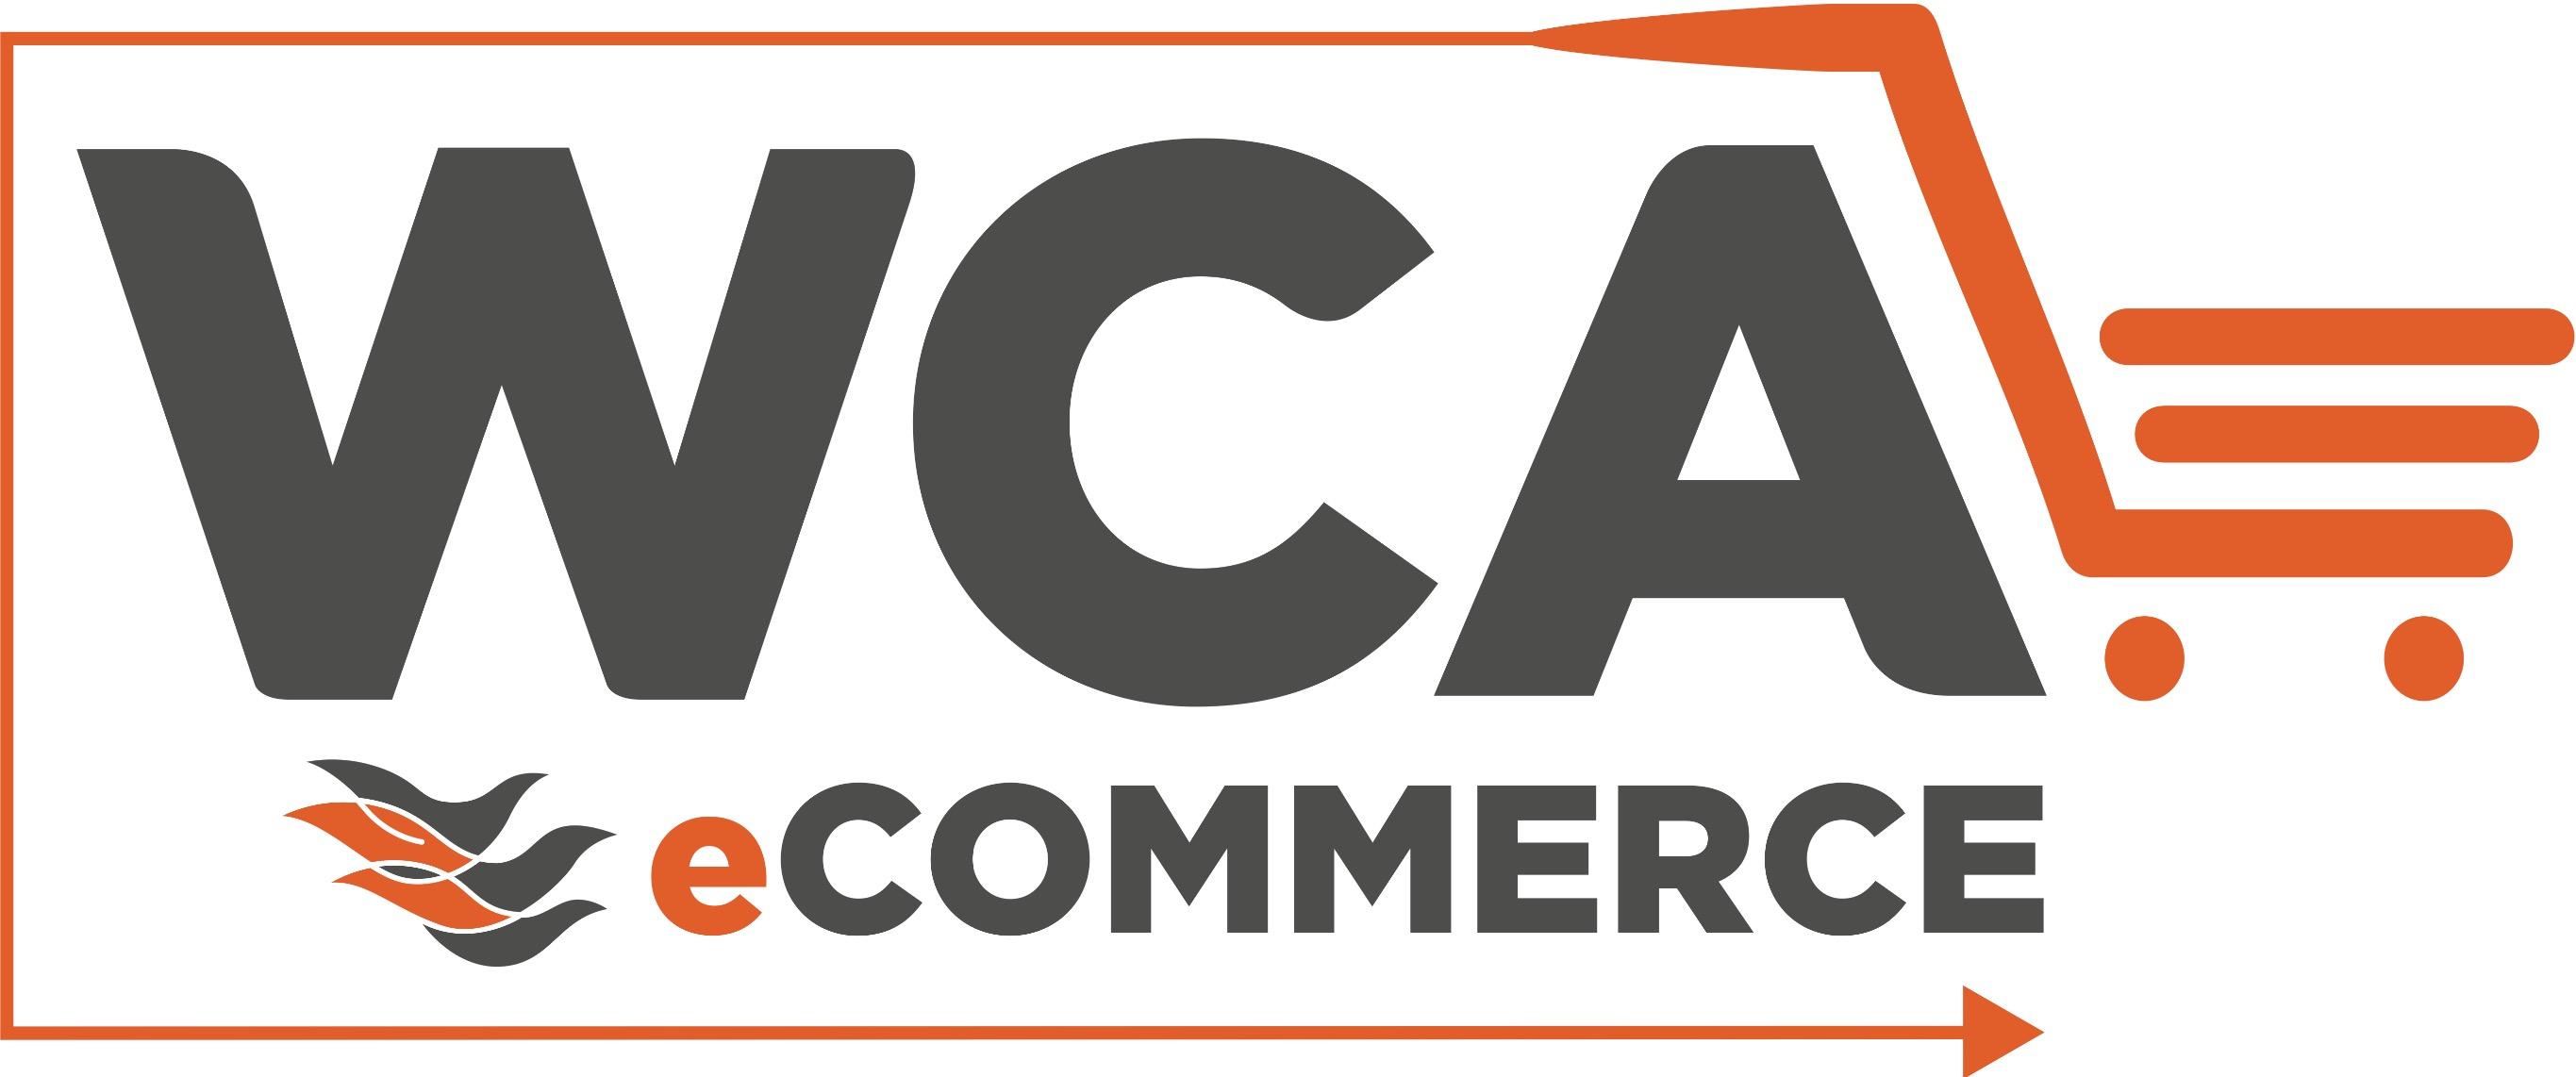 WCA_E-commerce